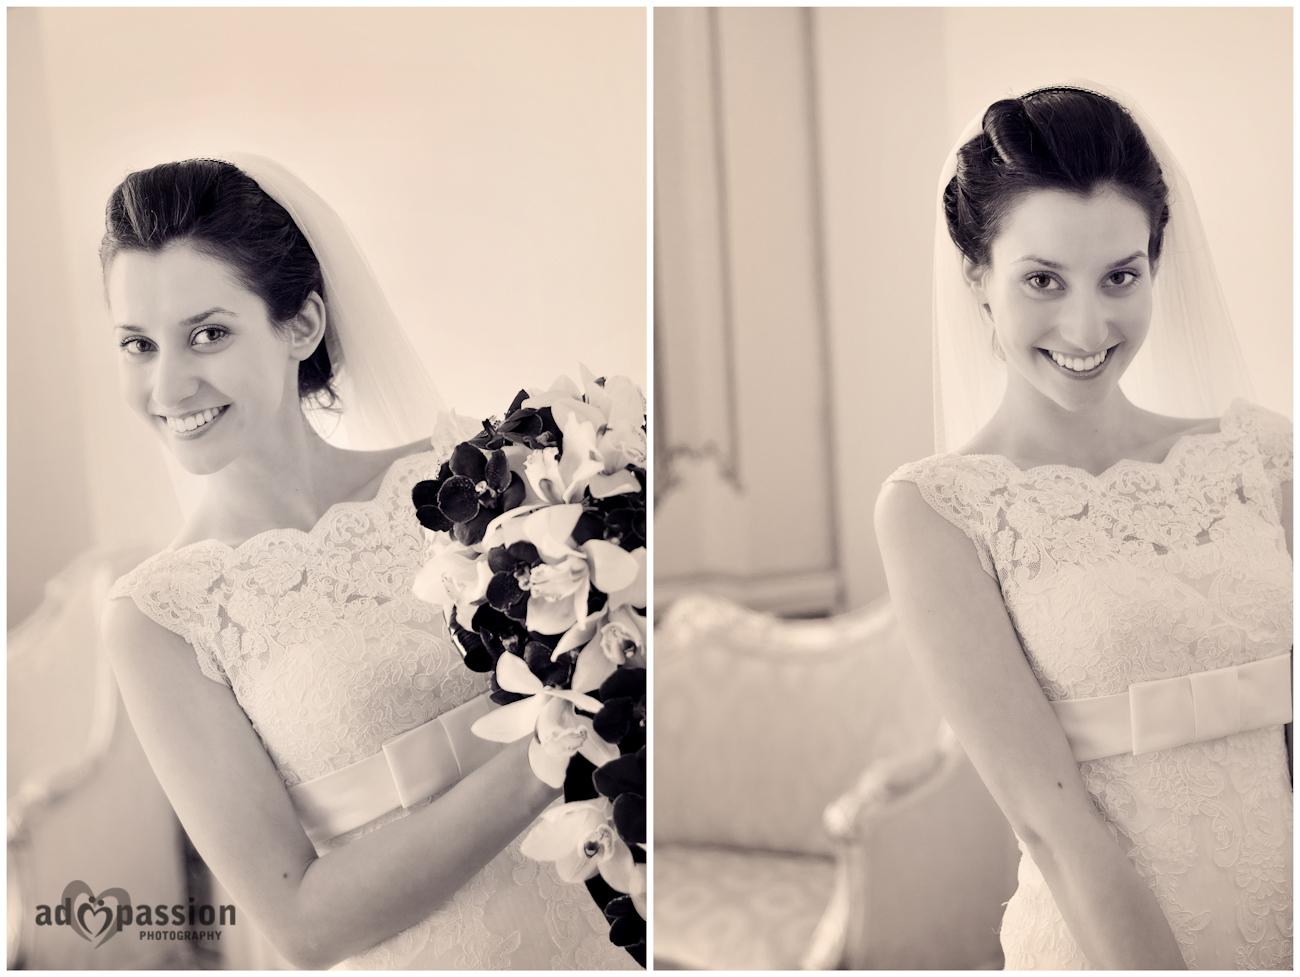 AD Passion Photography | 2011-05-22-Miriam&Florin_33 | Adelin, Dida, fotograf profesionist, fotograf de nunta, fotografie de nunta, fotograf Timisoara, fotograf Craiova, fotograf Bucuresti, fotograf Arad, nunta Timisoara, nunta Arad, nunta Bucuresti, nunta Craiova